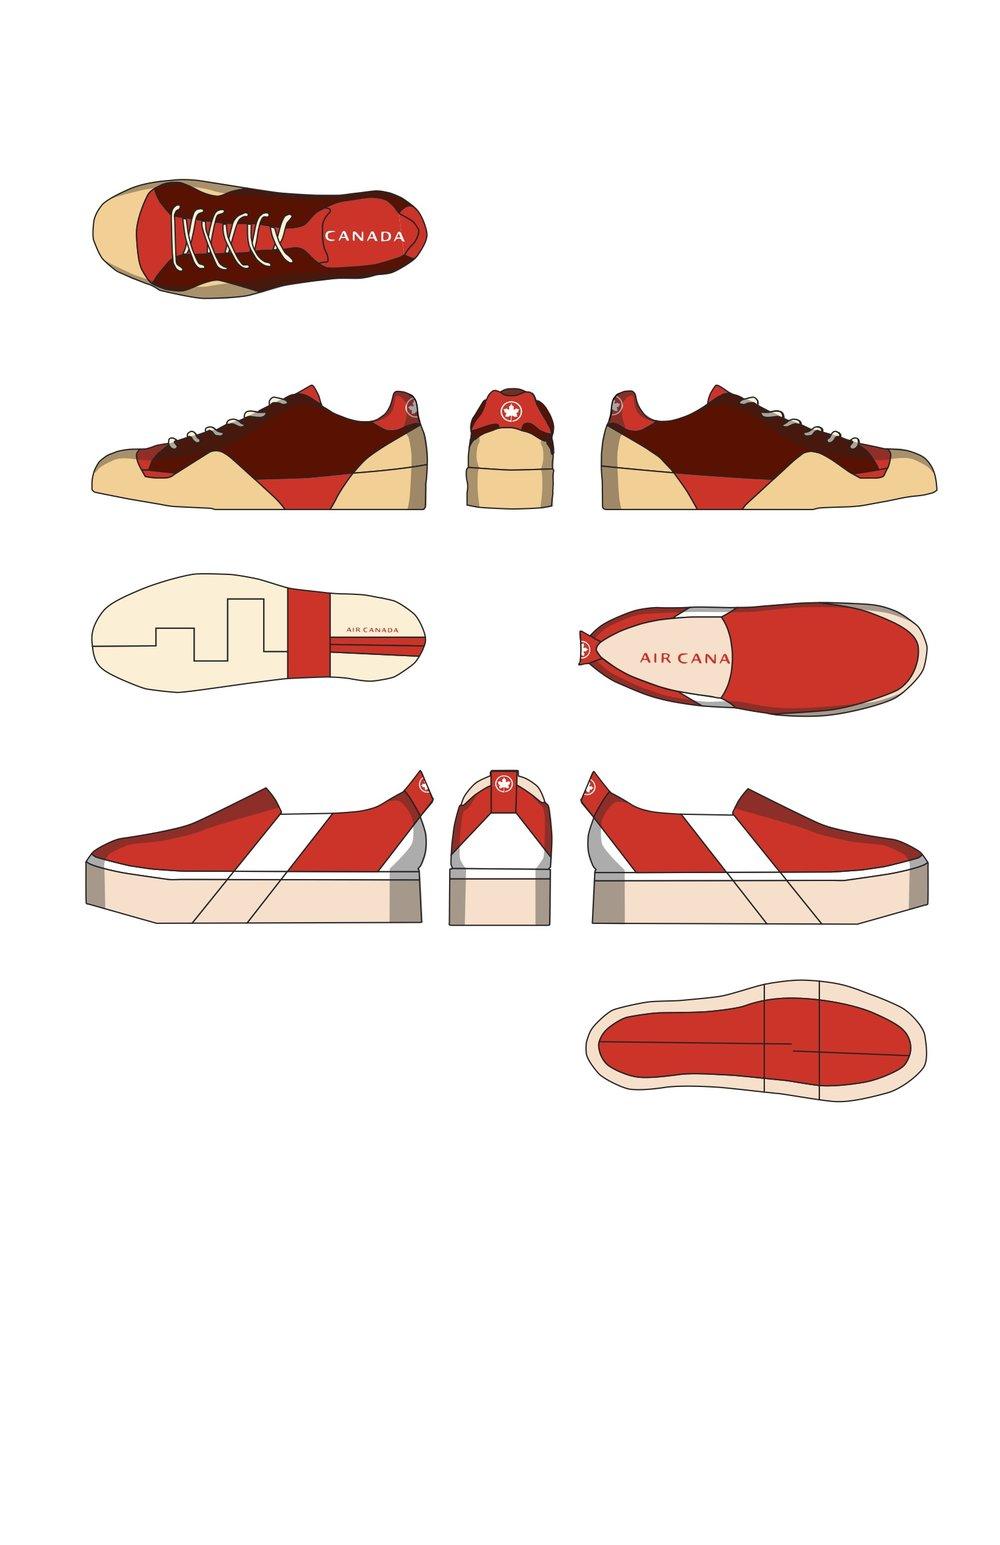 Flight Shoe Canada copy.jpg